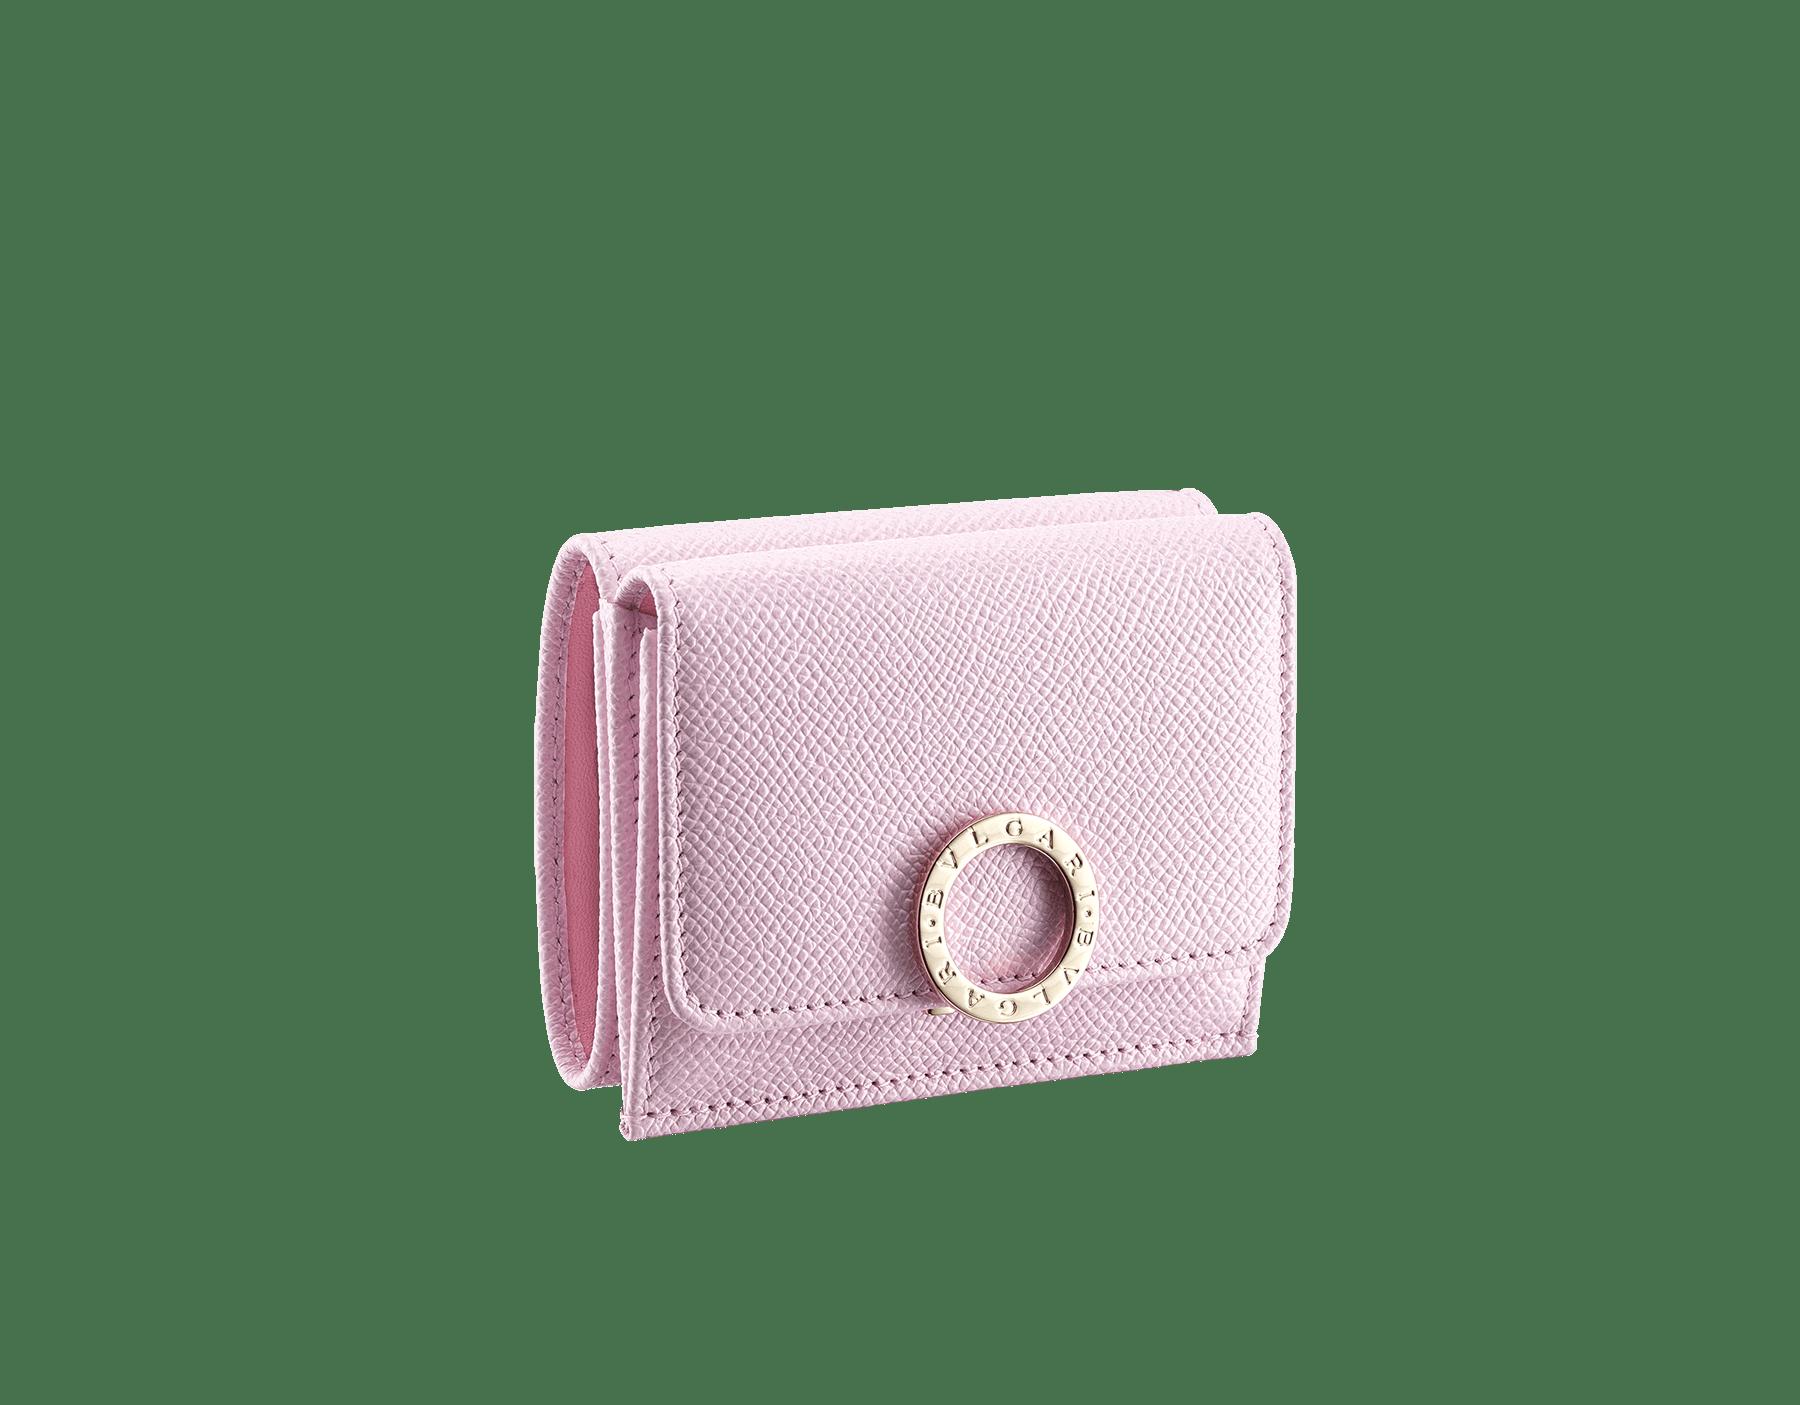 BVLGARI BVLGARI 小巧皮夾,採用雛菊拓帕石色亮珠面小牛皮和水晶玫瑰色 Nappa 軟面皮。掀蓋開合,經典淡金色黃銅品牌標誌扣環和按扣。 579-MINICOMPACTa image 1